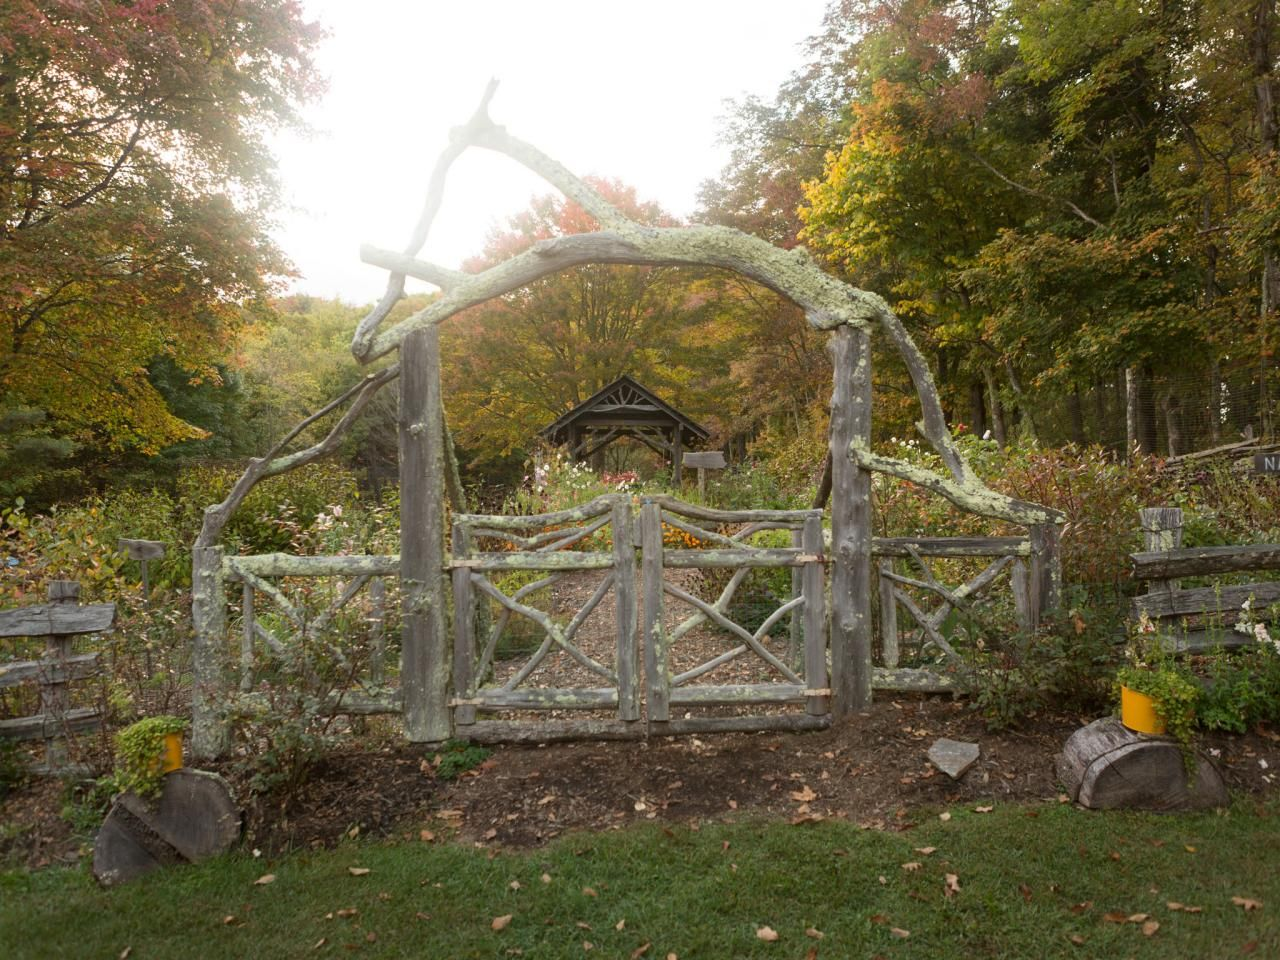 Country Inn Garden with Rustic Gateway Rustic backyard